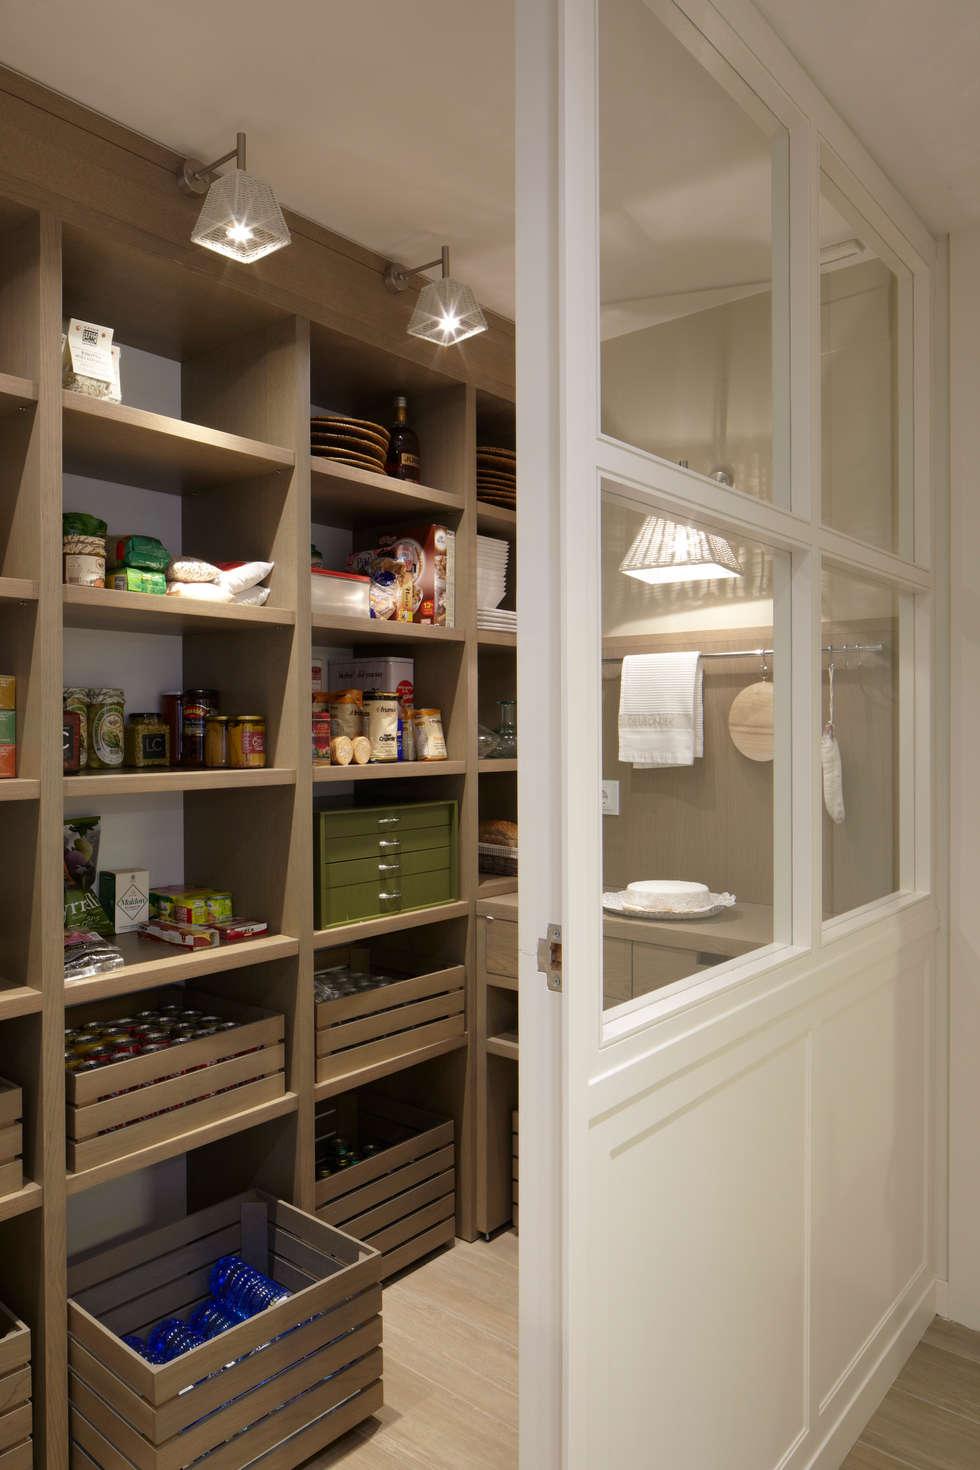 Fotos de decoraci n y dise o de interiores homify for Despensas de cocina a medida